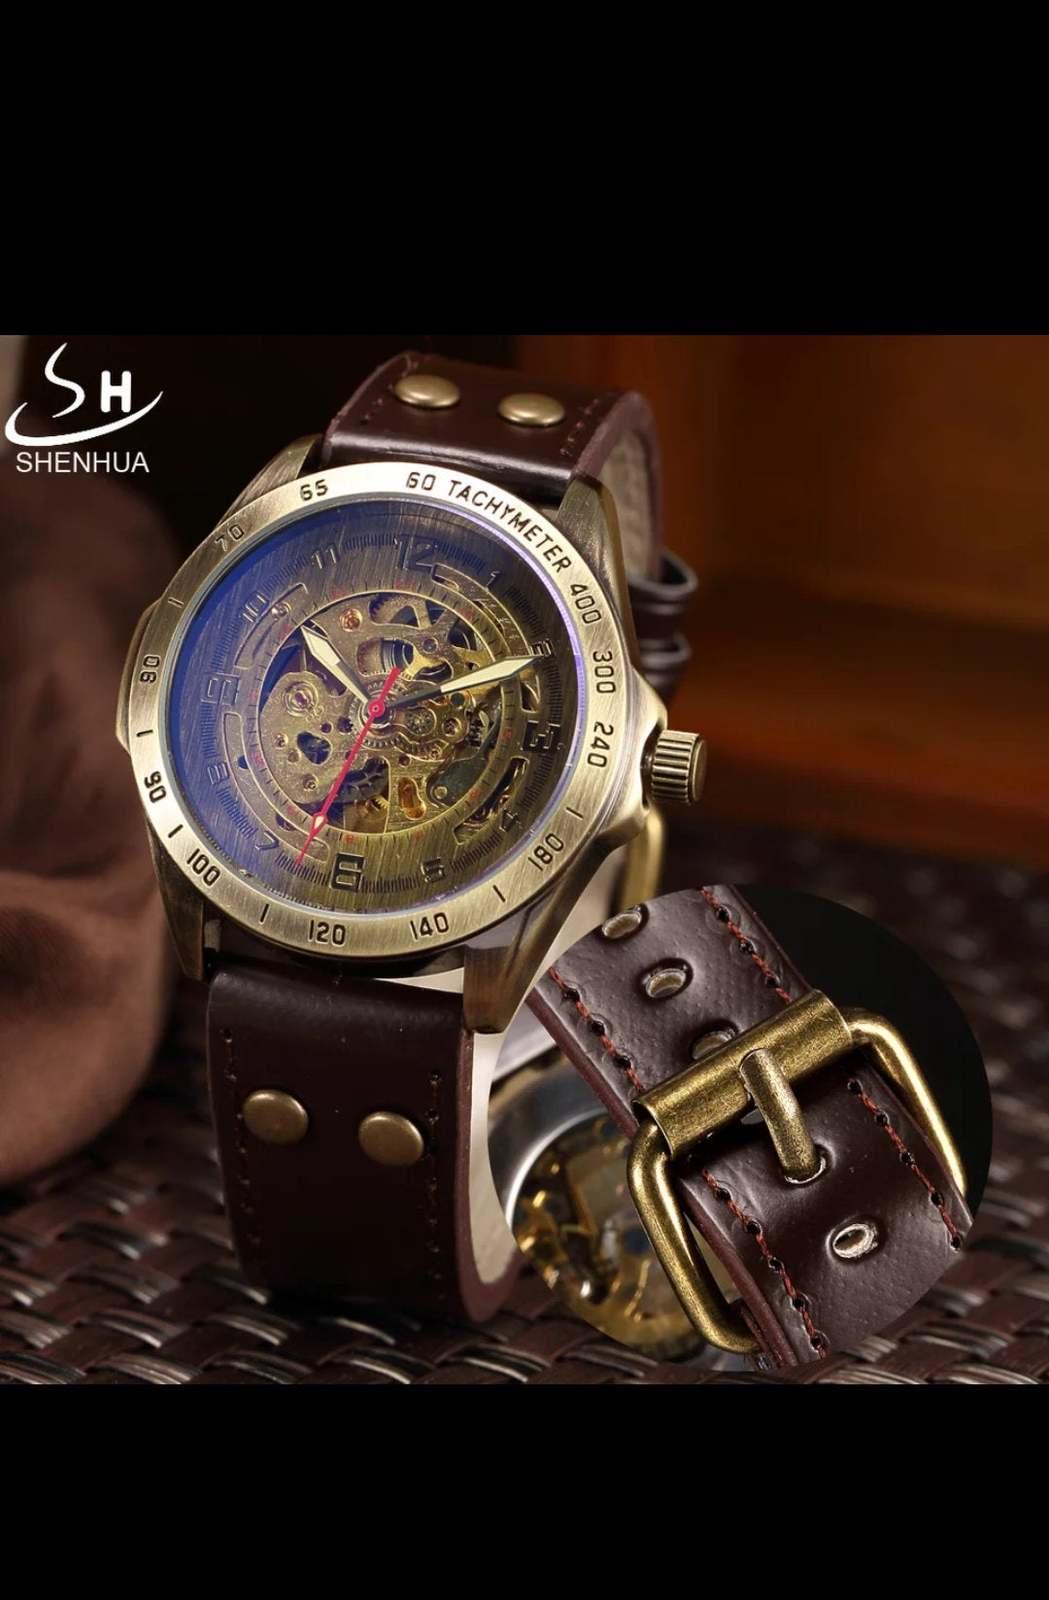 Luxury Vintage Retro Automatic Mechanical Watch- Automatics Self-Wind- Antique w image 2